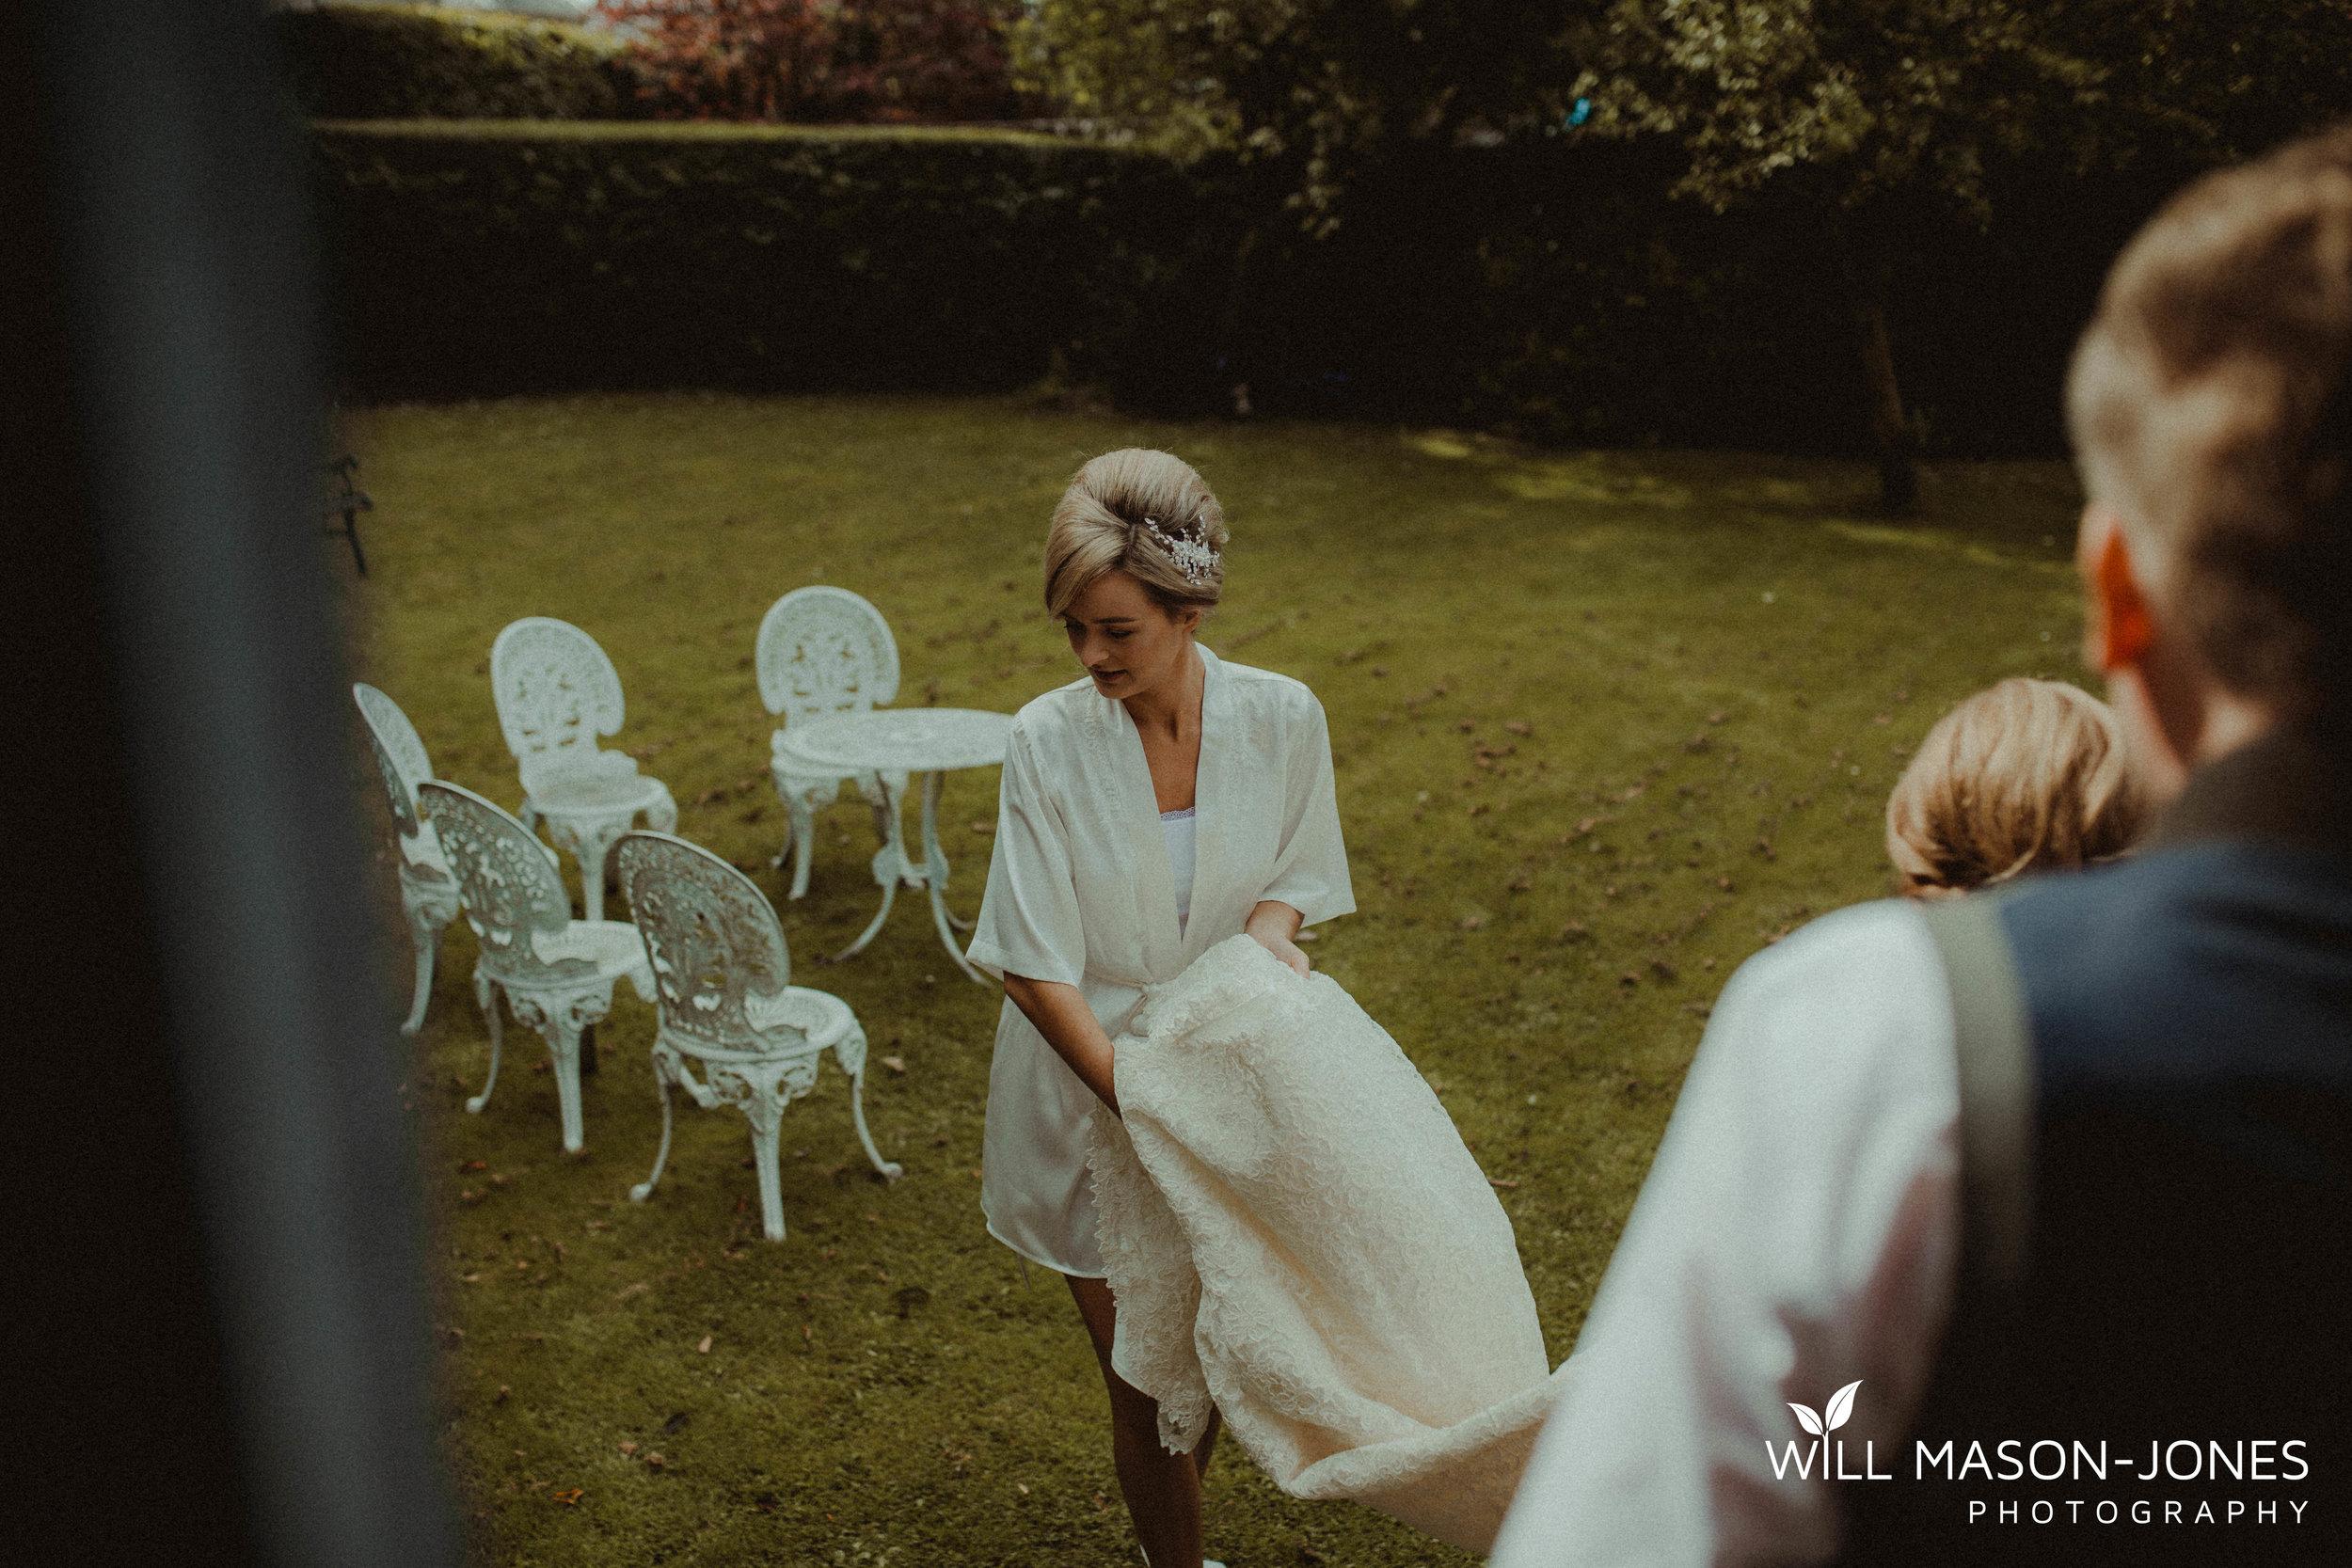 loch-lomond-destination-wedding-photographer-scotland-uk-wales-17.jpg